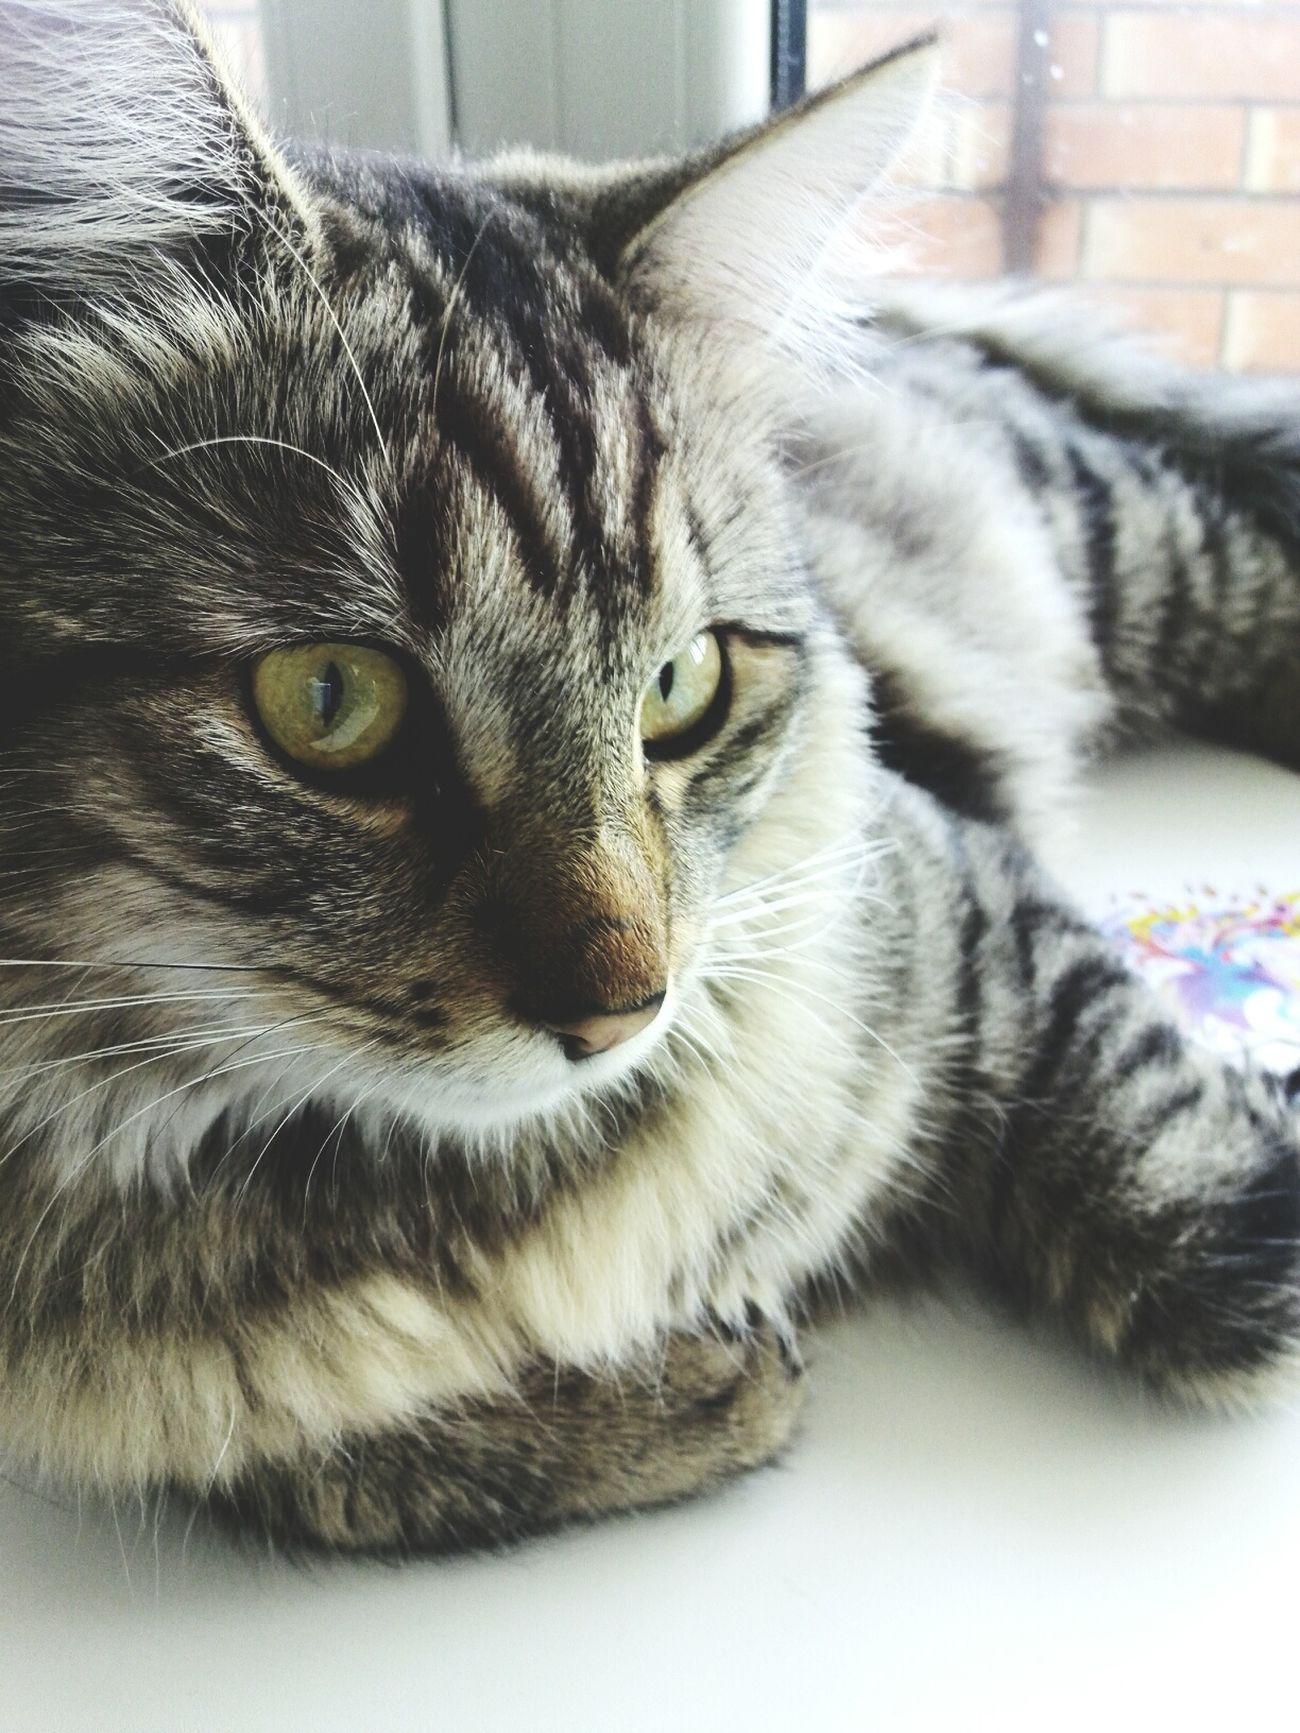 My cat Mortimer Mortimer Cat Cat Lovers Animals Morning Goodmorning Enjoying Life